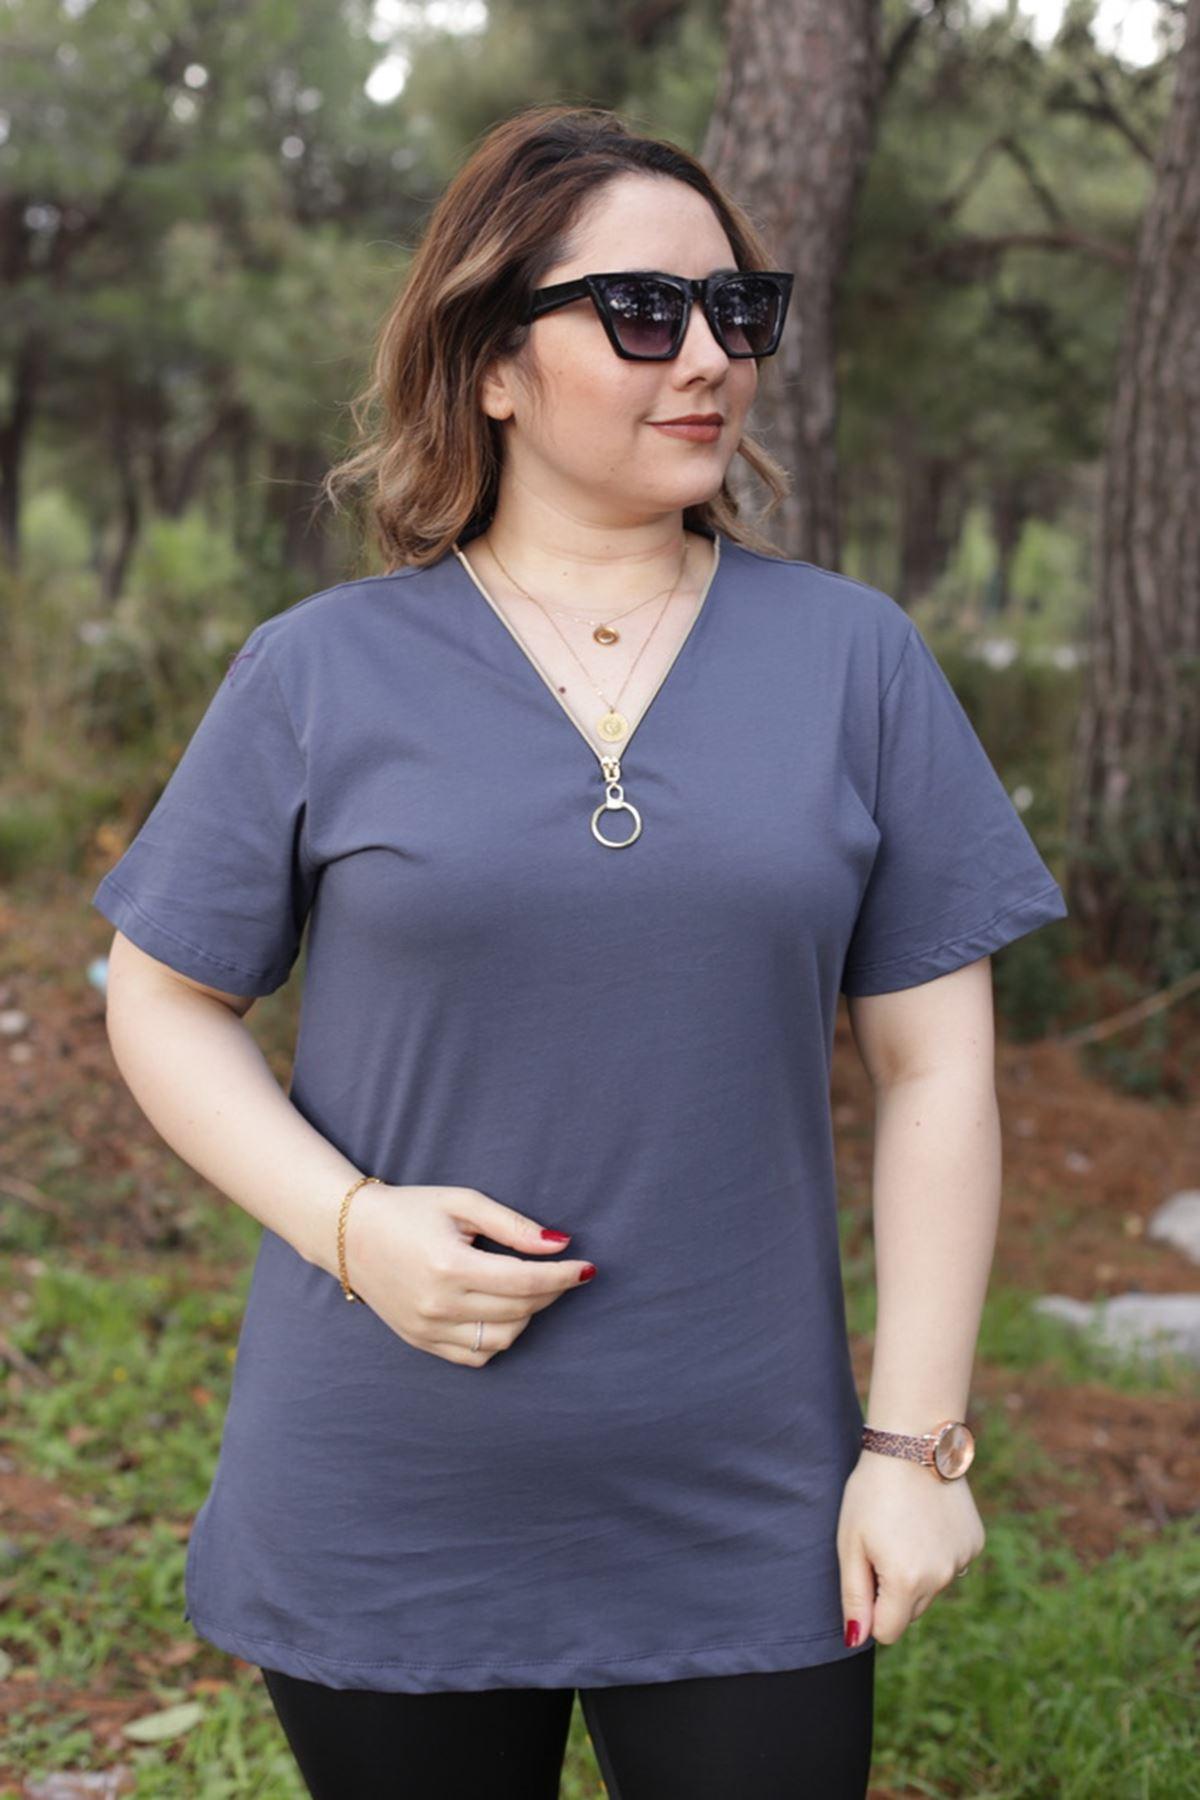 RENKTE GENİŞ KESİM FERMUARLI LACİVERT T-SHİRT